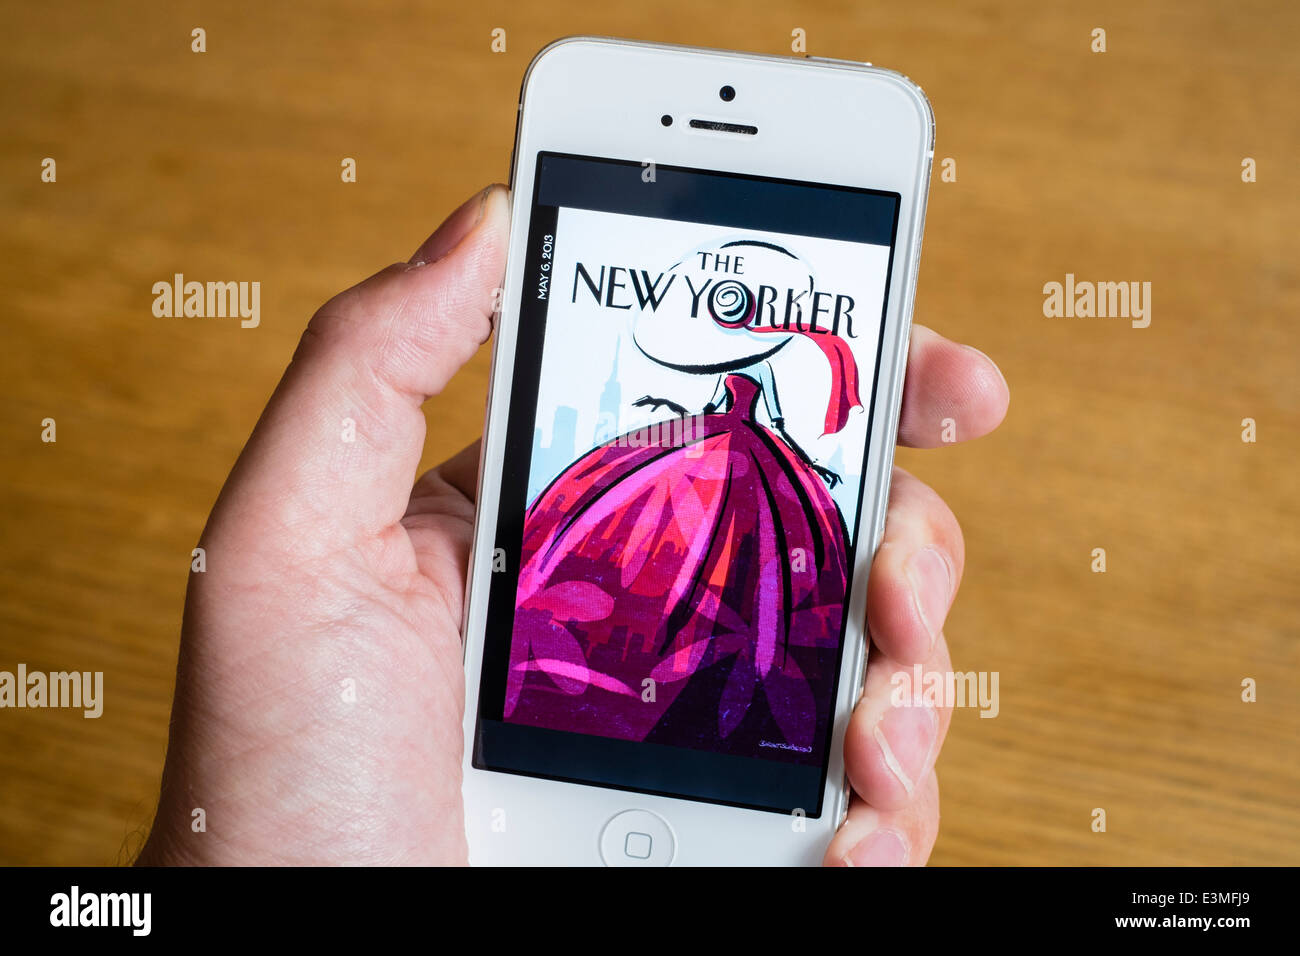 Detail des New Yorker mobile Online-app auf iPhone Smartphone Stockbild